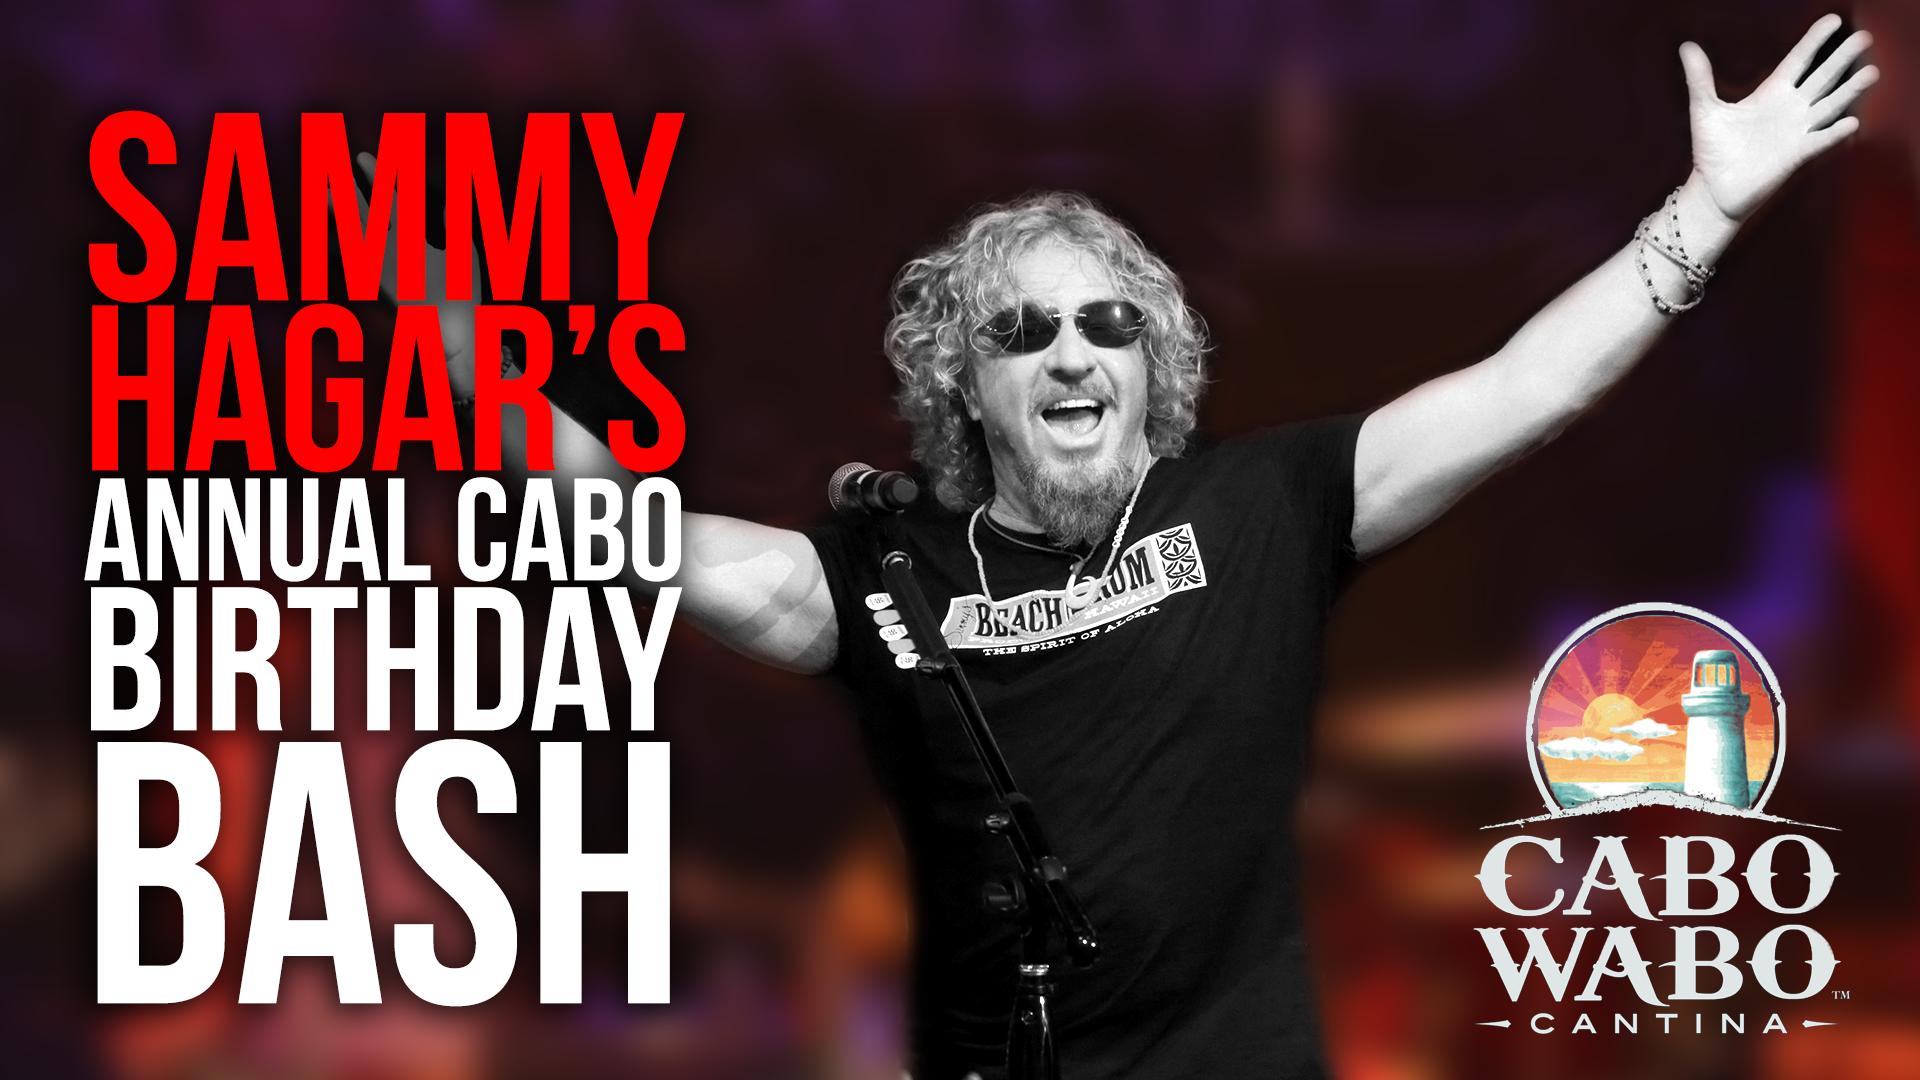 2016 10 13 Cabo Wabo Cantina Birthday Bash Night 4 Sammy Hagar Rock Music History When The Levee Breaks